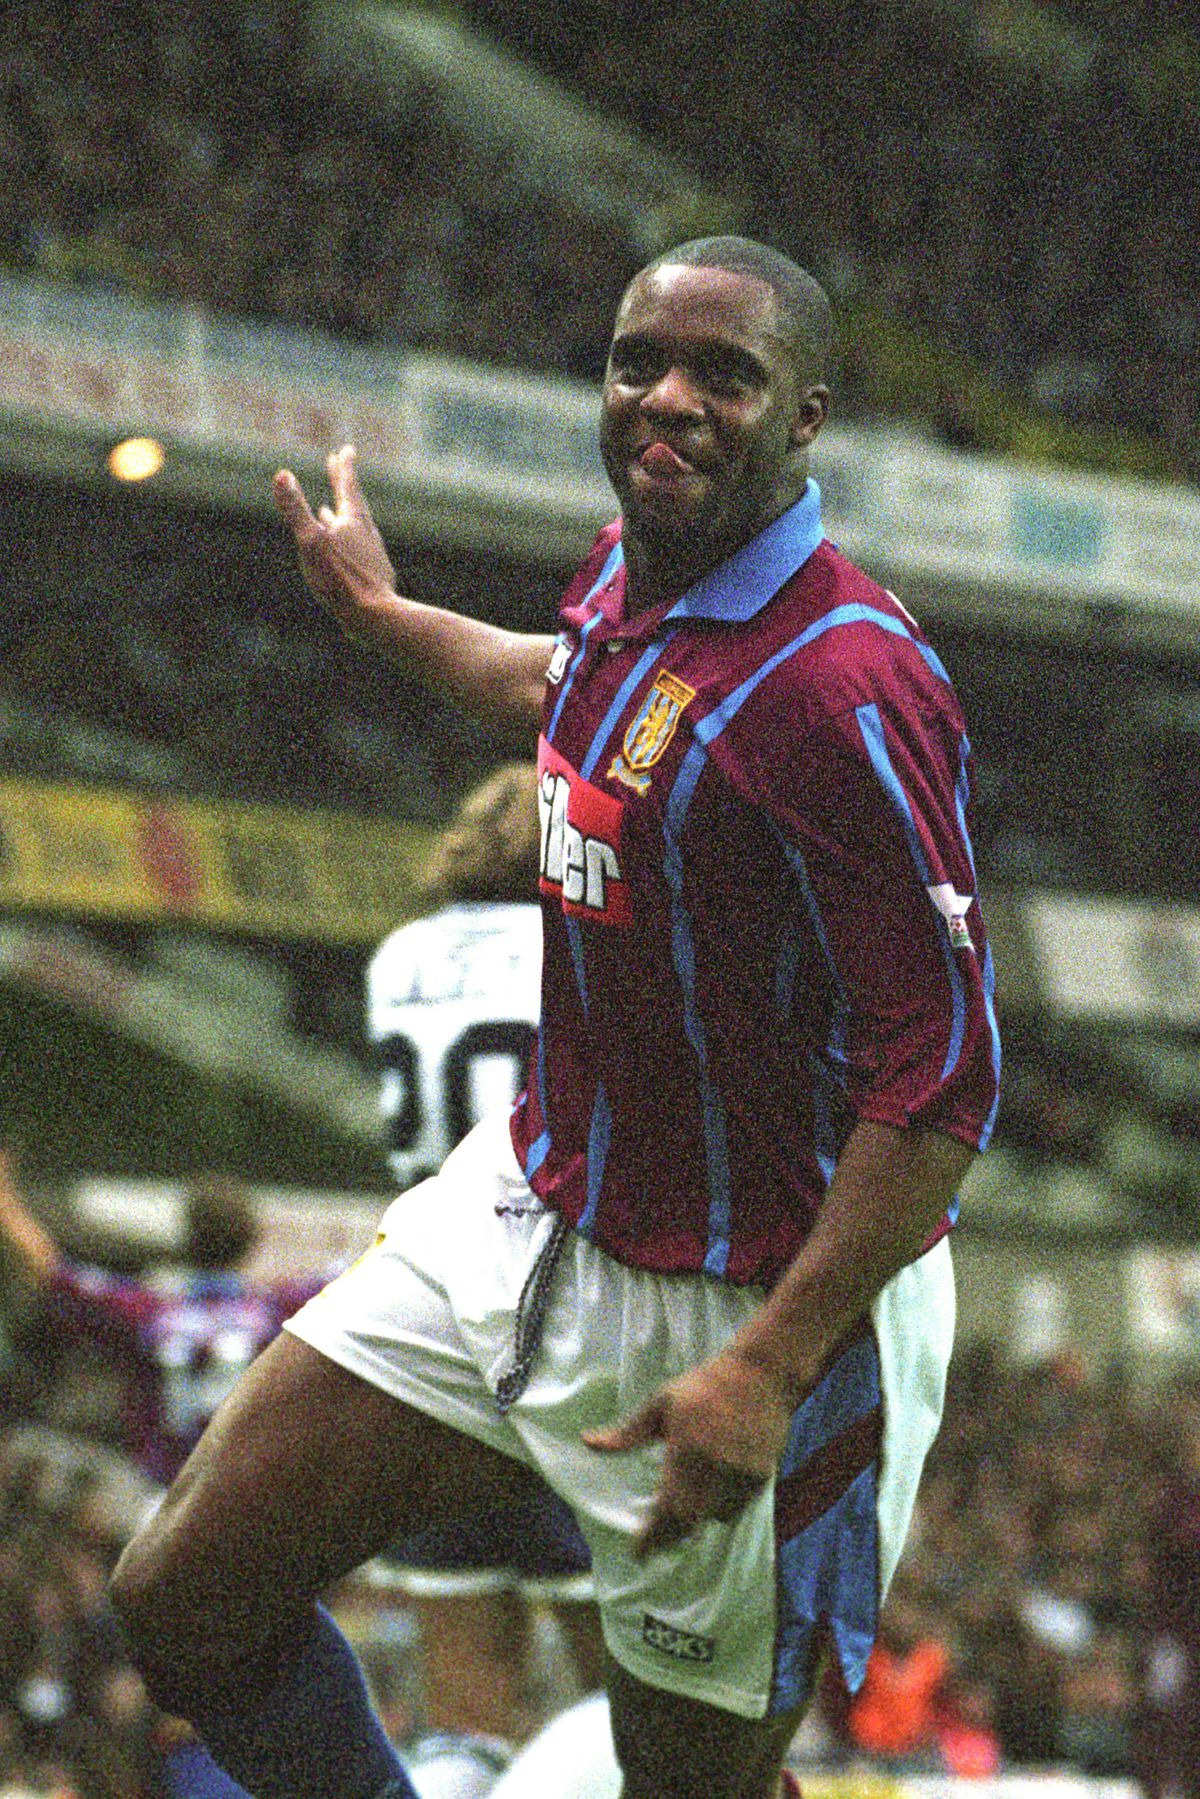 Dalian Atkinson played for Aston Villa during his footballing career